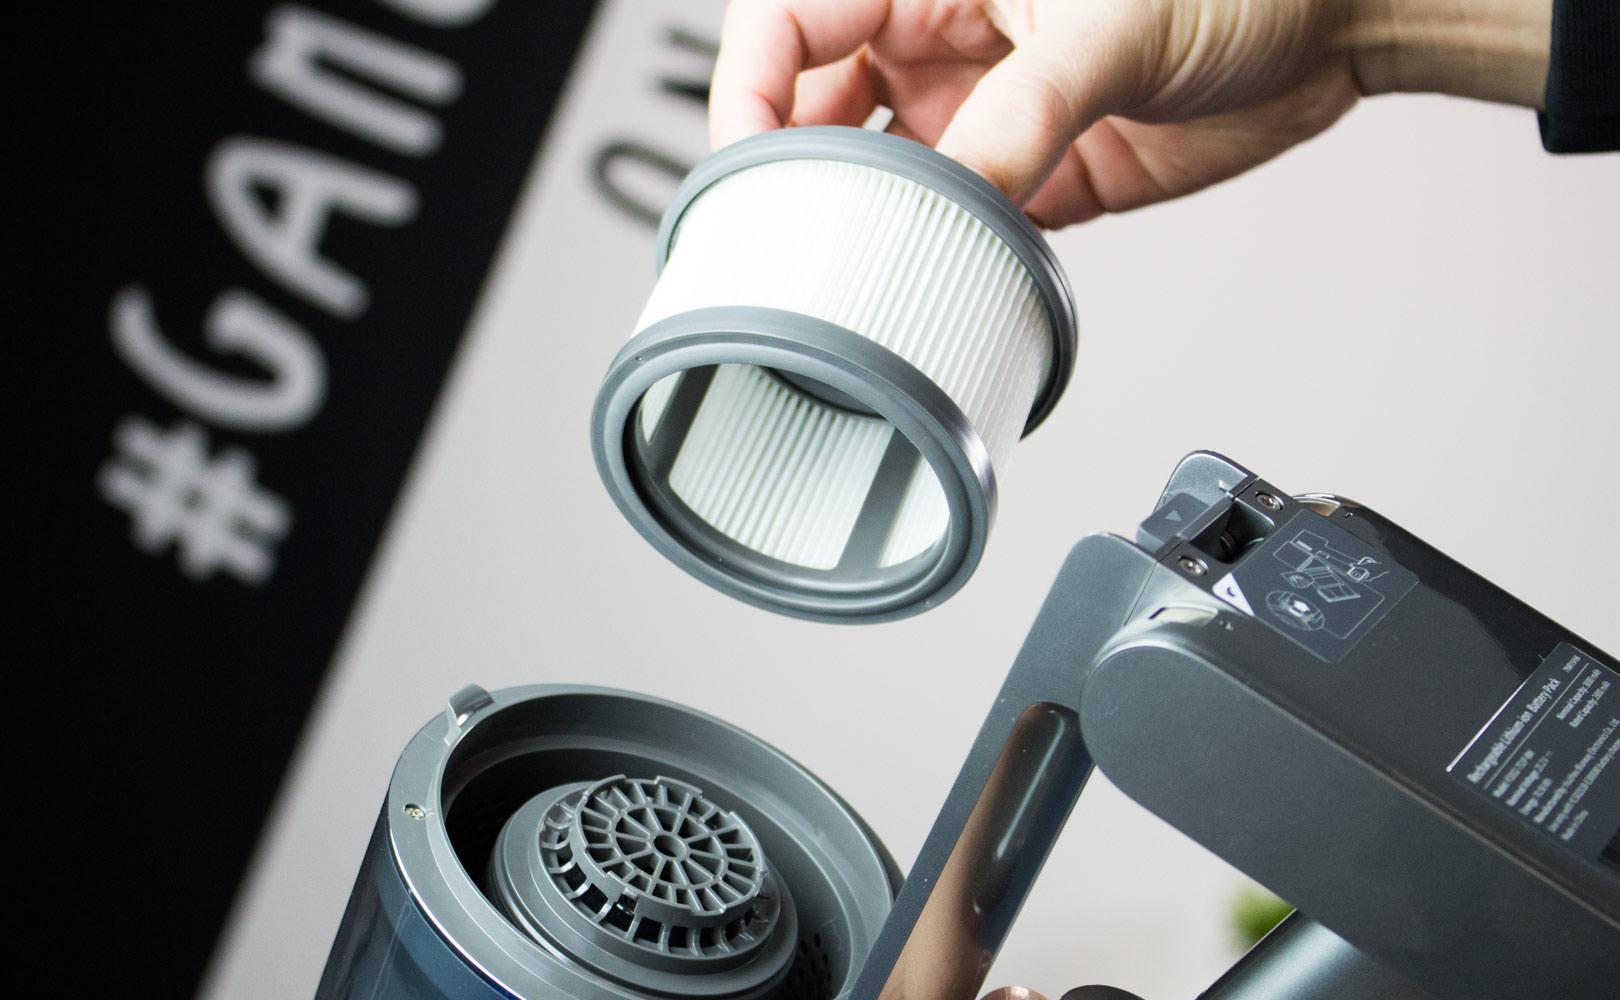 filtr HEPA w odkurzaczu The Dreame T20